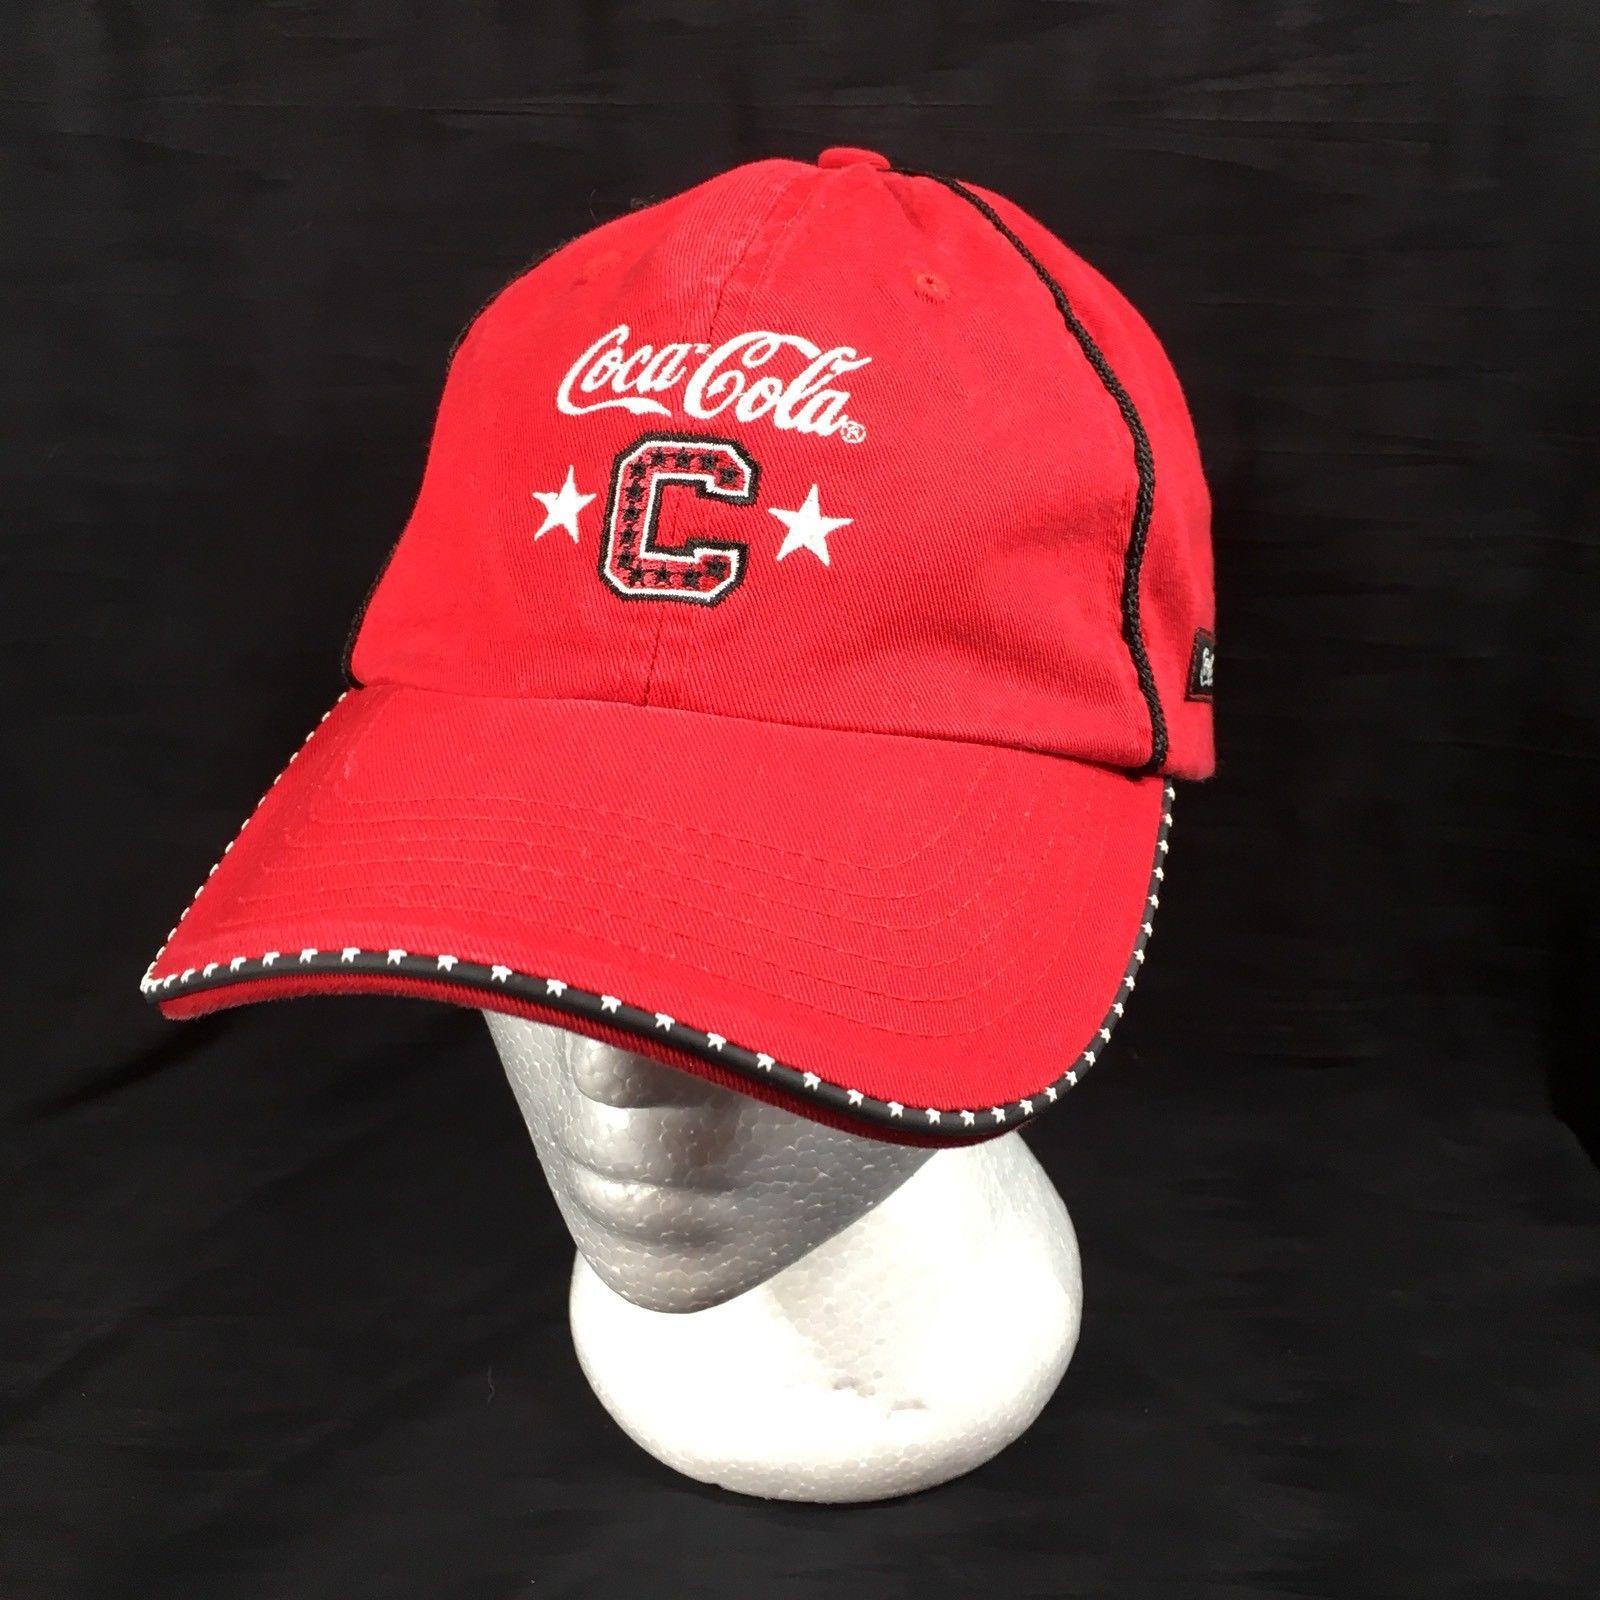 38ec18eeb1a Coca Cola Embroidered Baseball Cap Hat Red and 50 similar items. S l1600